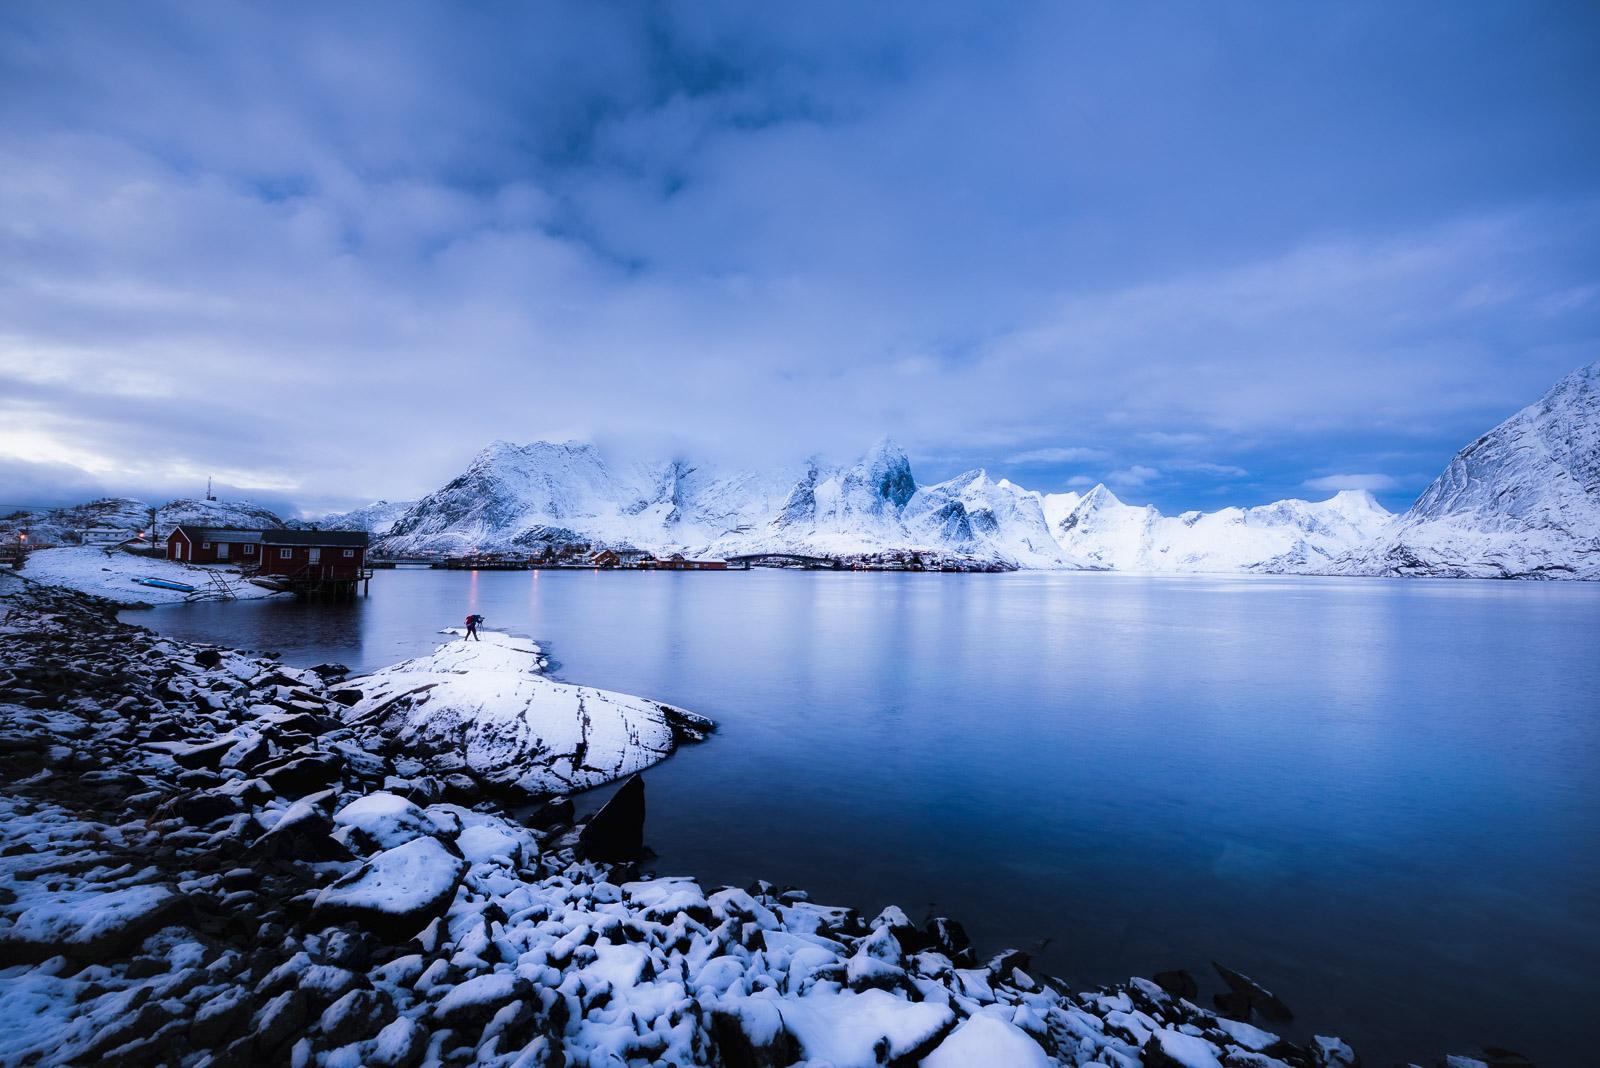 landscape photographer, Sakrisoy, Lofoten, Norway